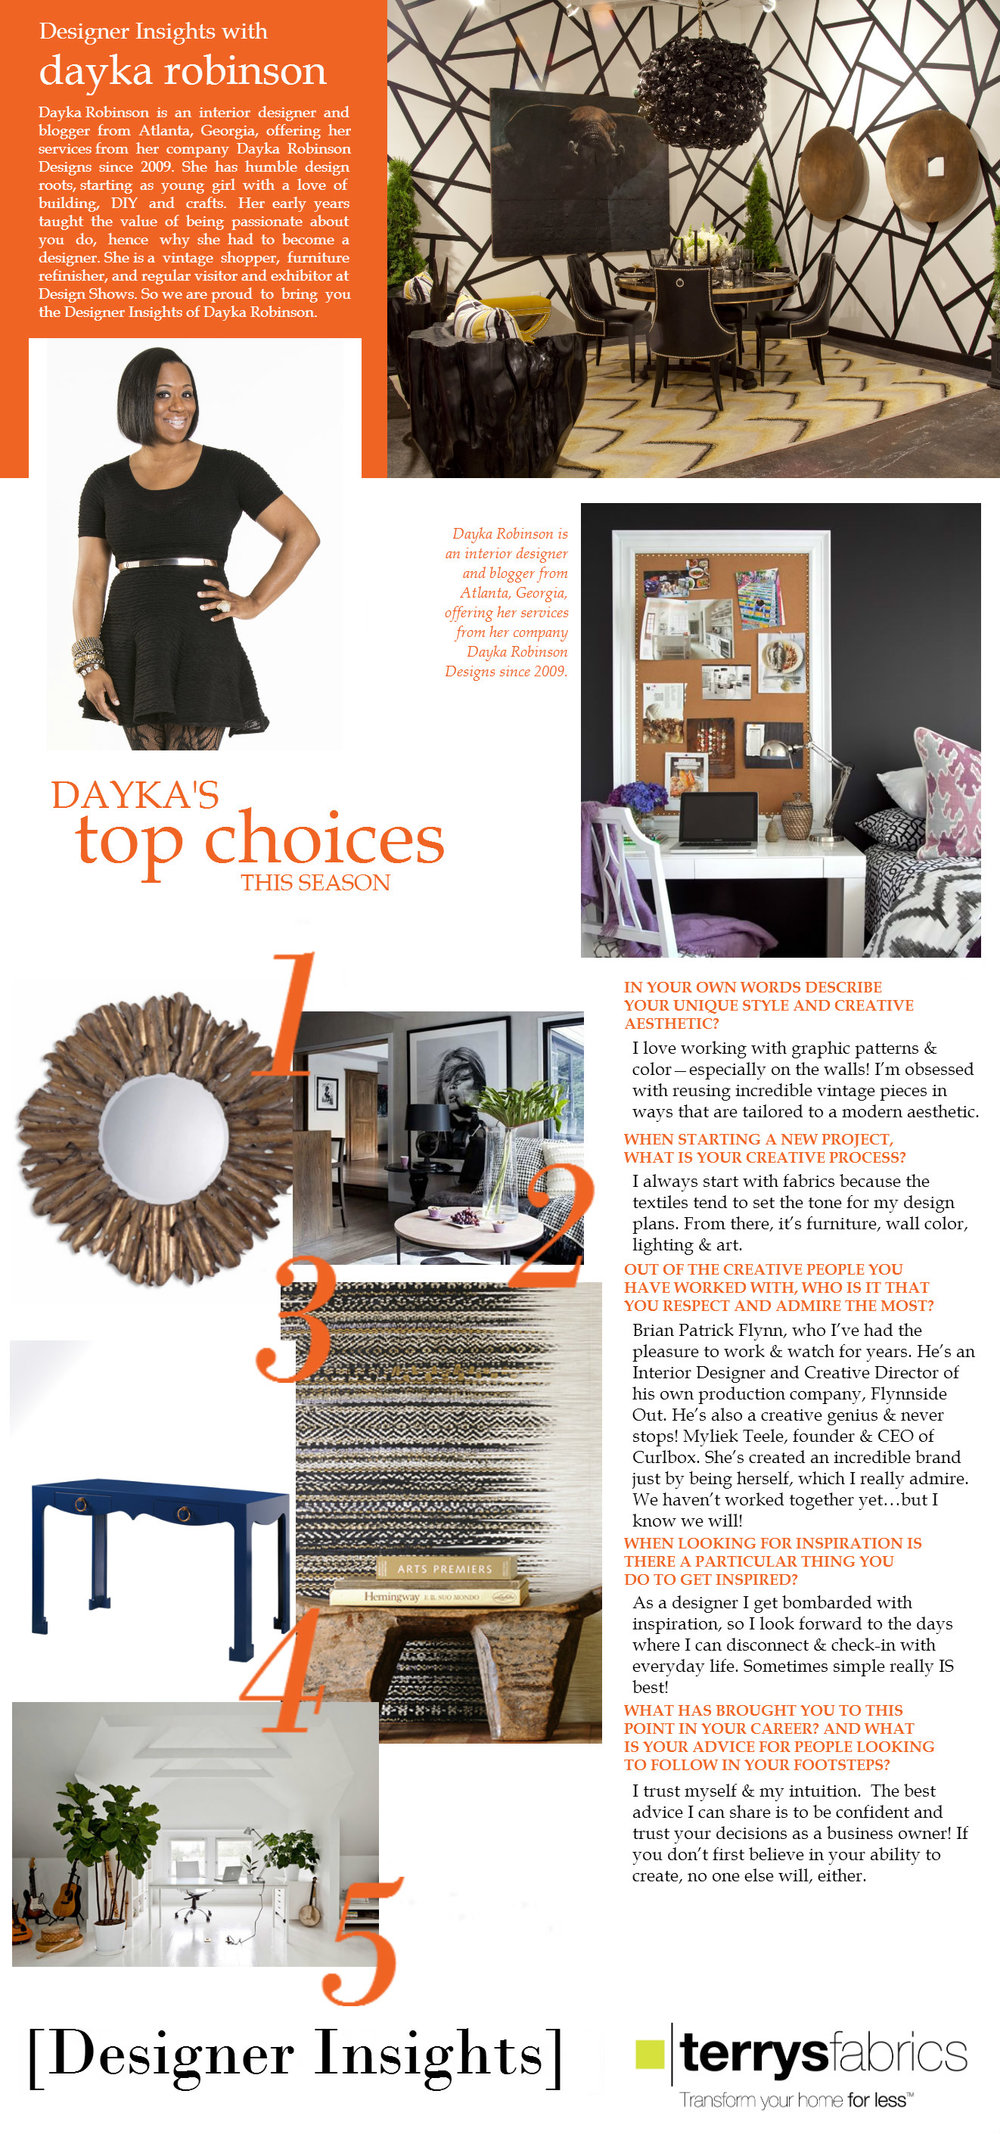 Designer-Insights-Dayka-Robinson.jpg